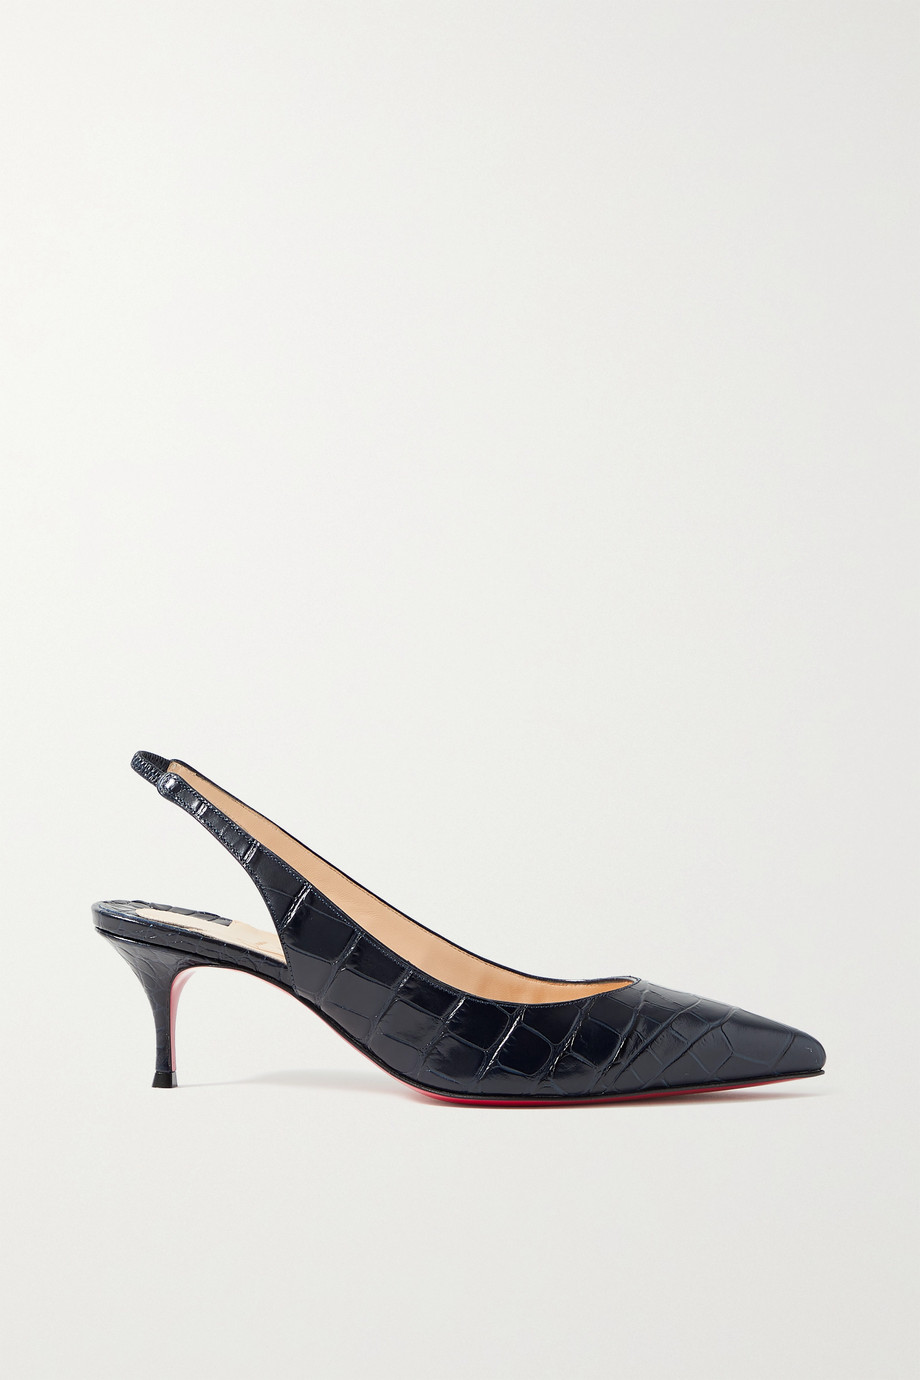 Christian Louboutin Kate 55 croc-effect leather slingback pumps